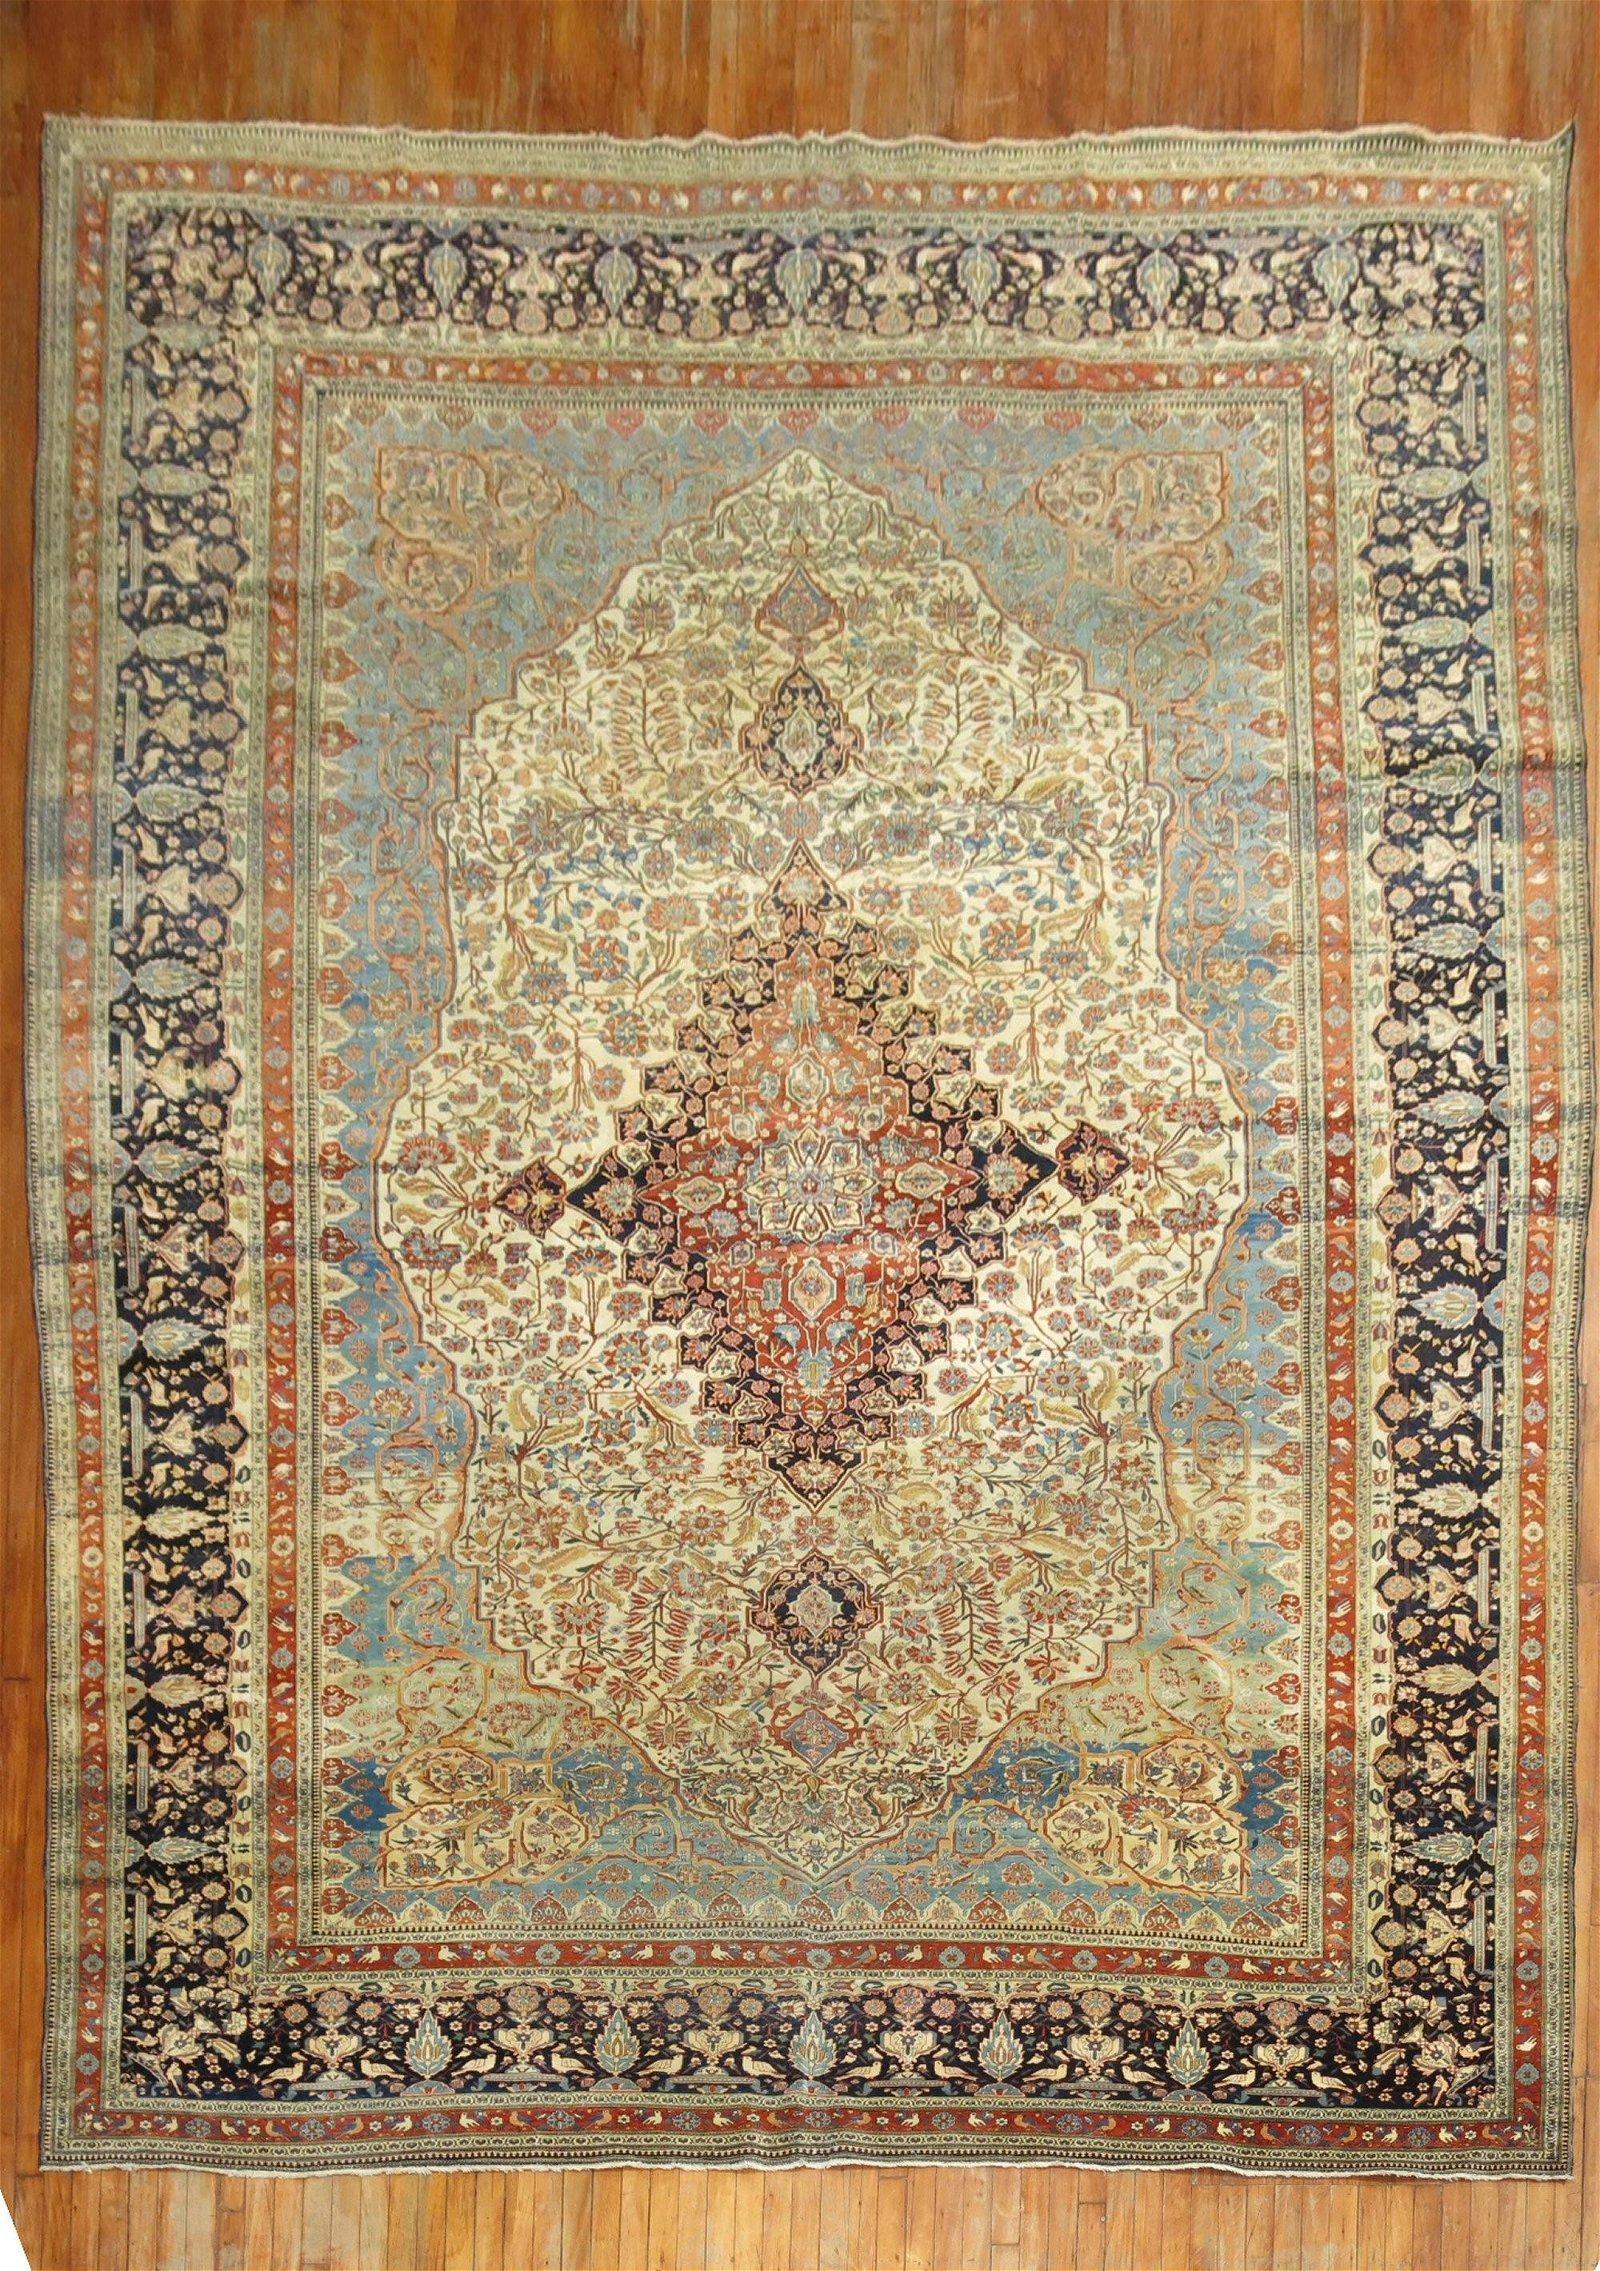 19th Century Room Size Mohtasham Kashan Rug